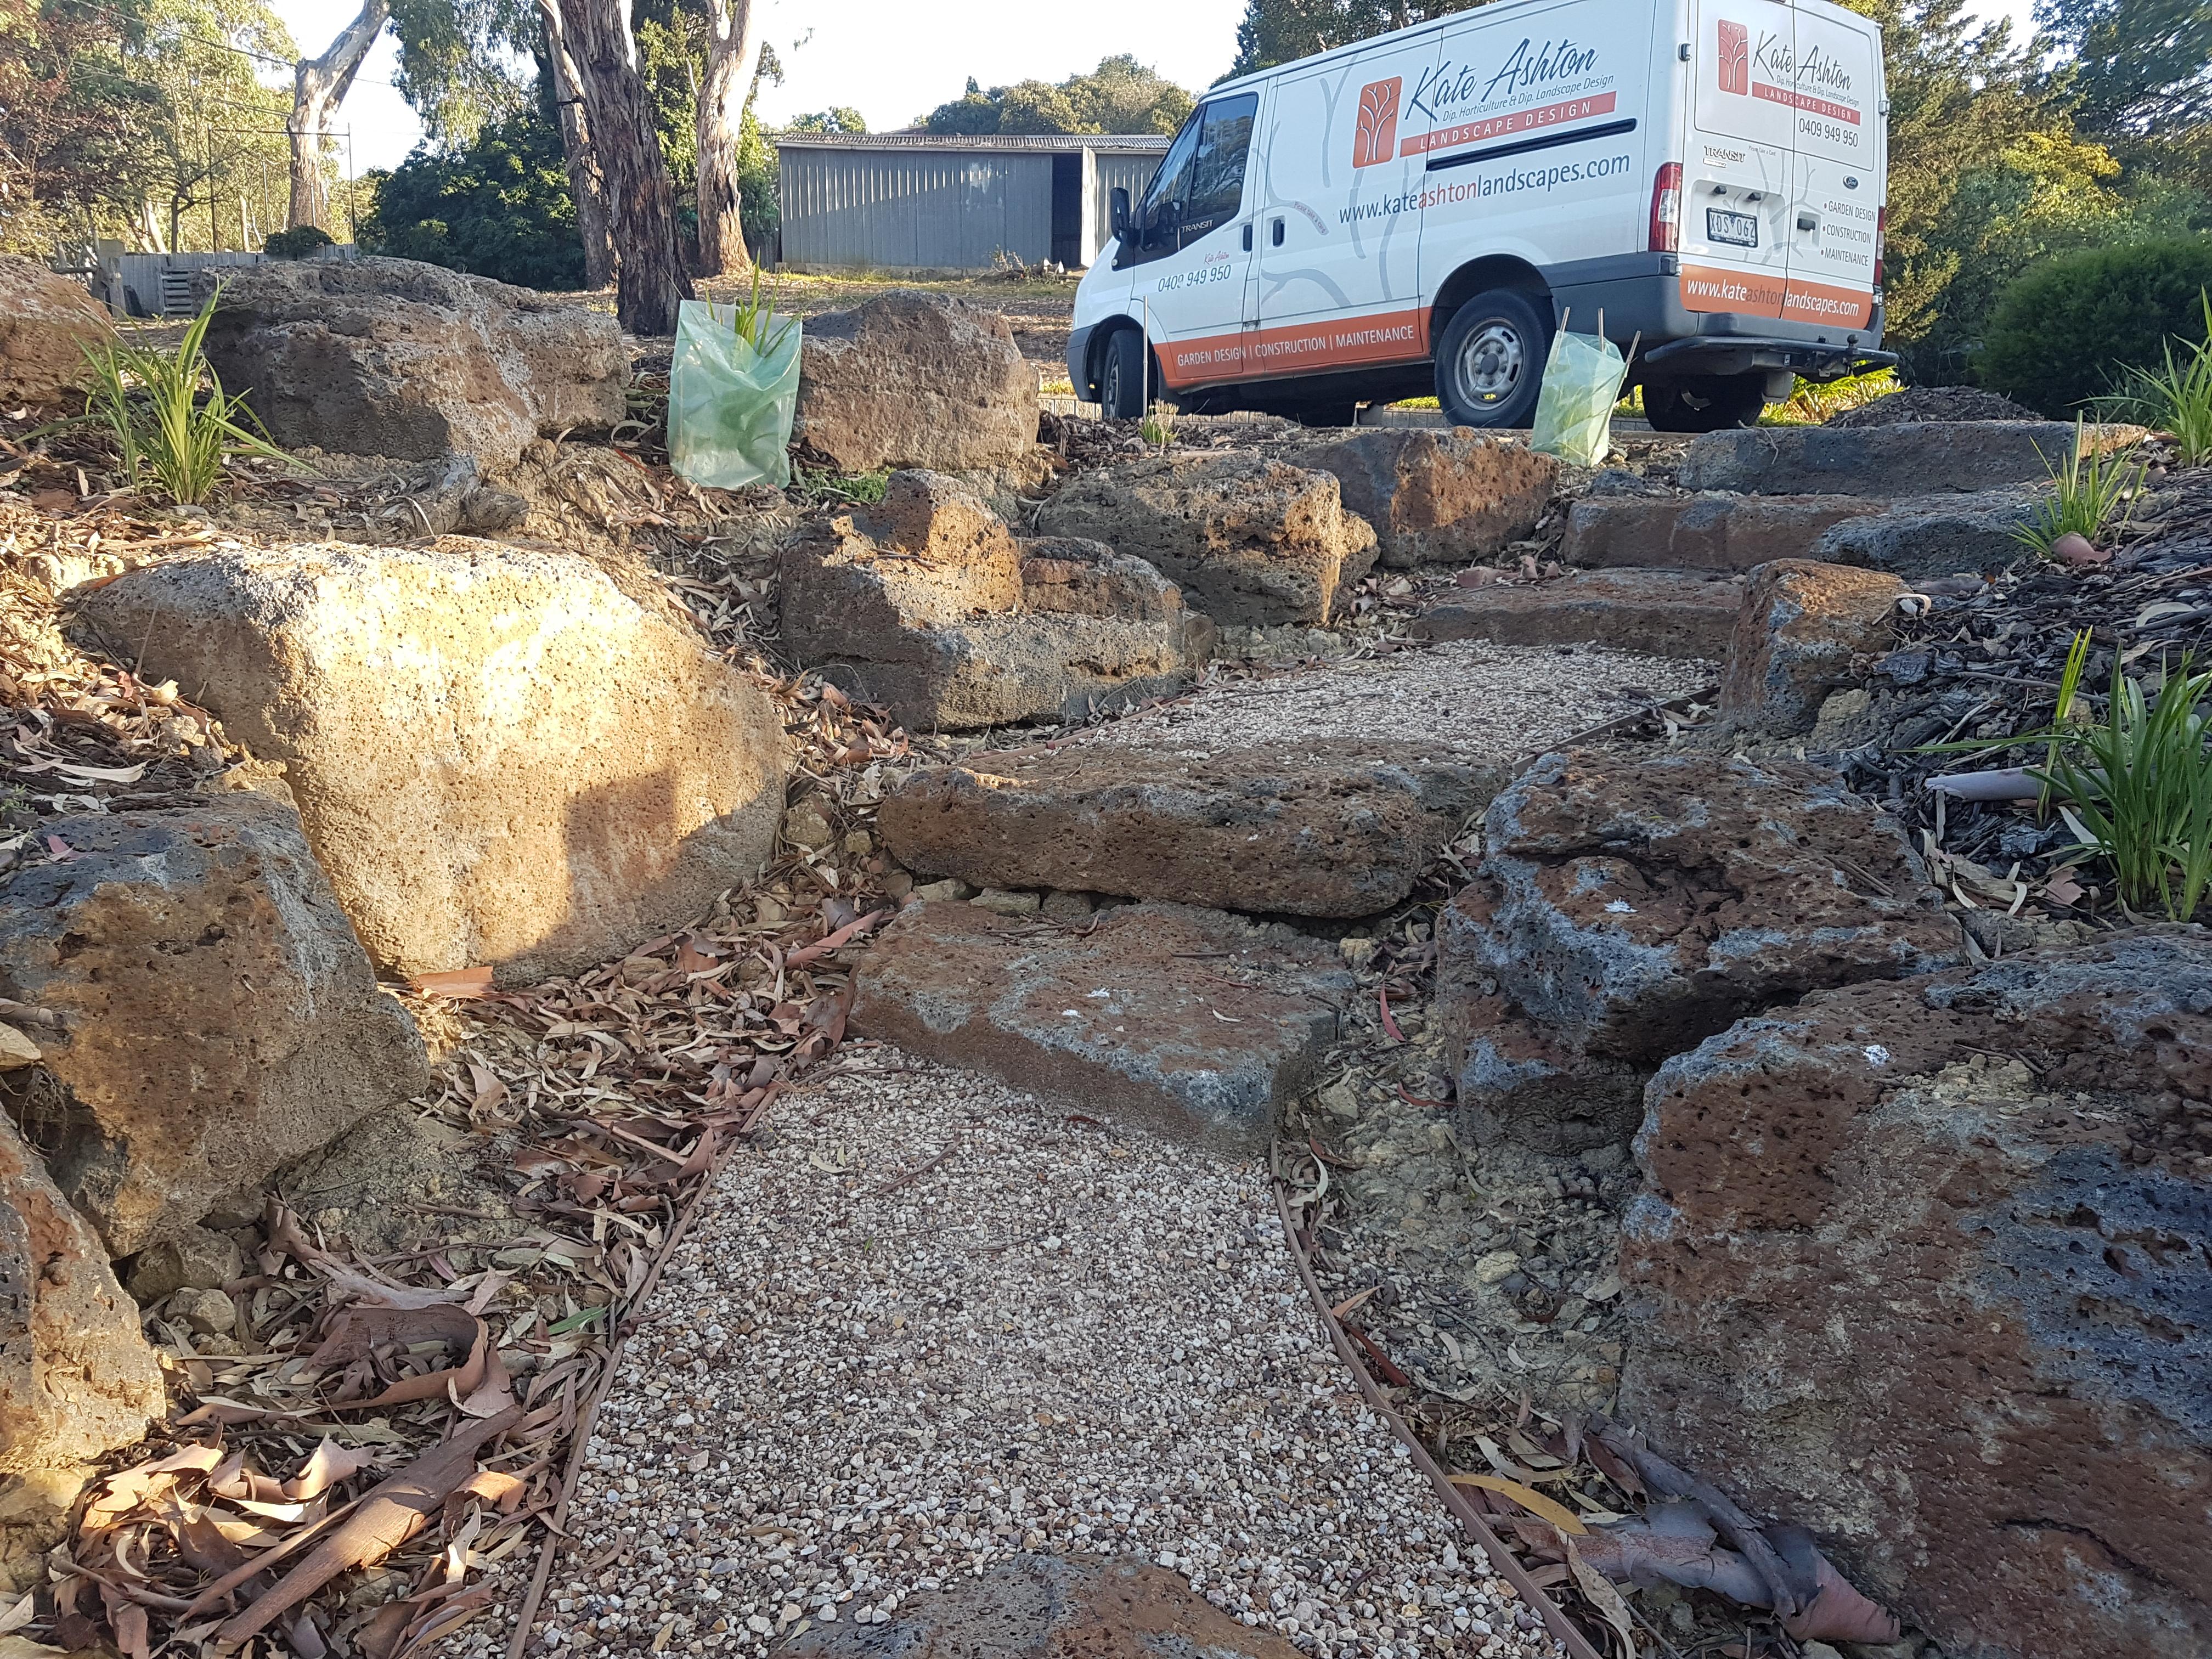 Colac Rock steps, Drought tolerant plants, Compacted sandstone, Colac Rock,